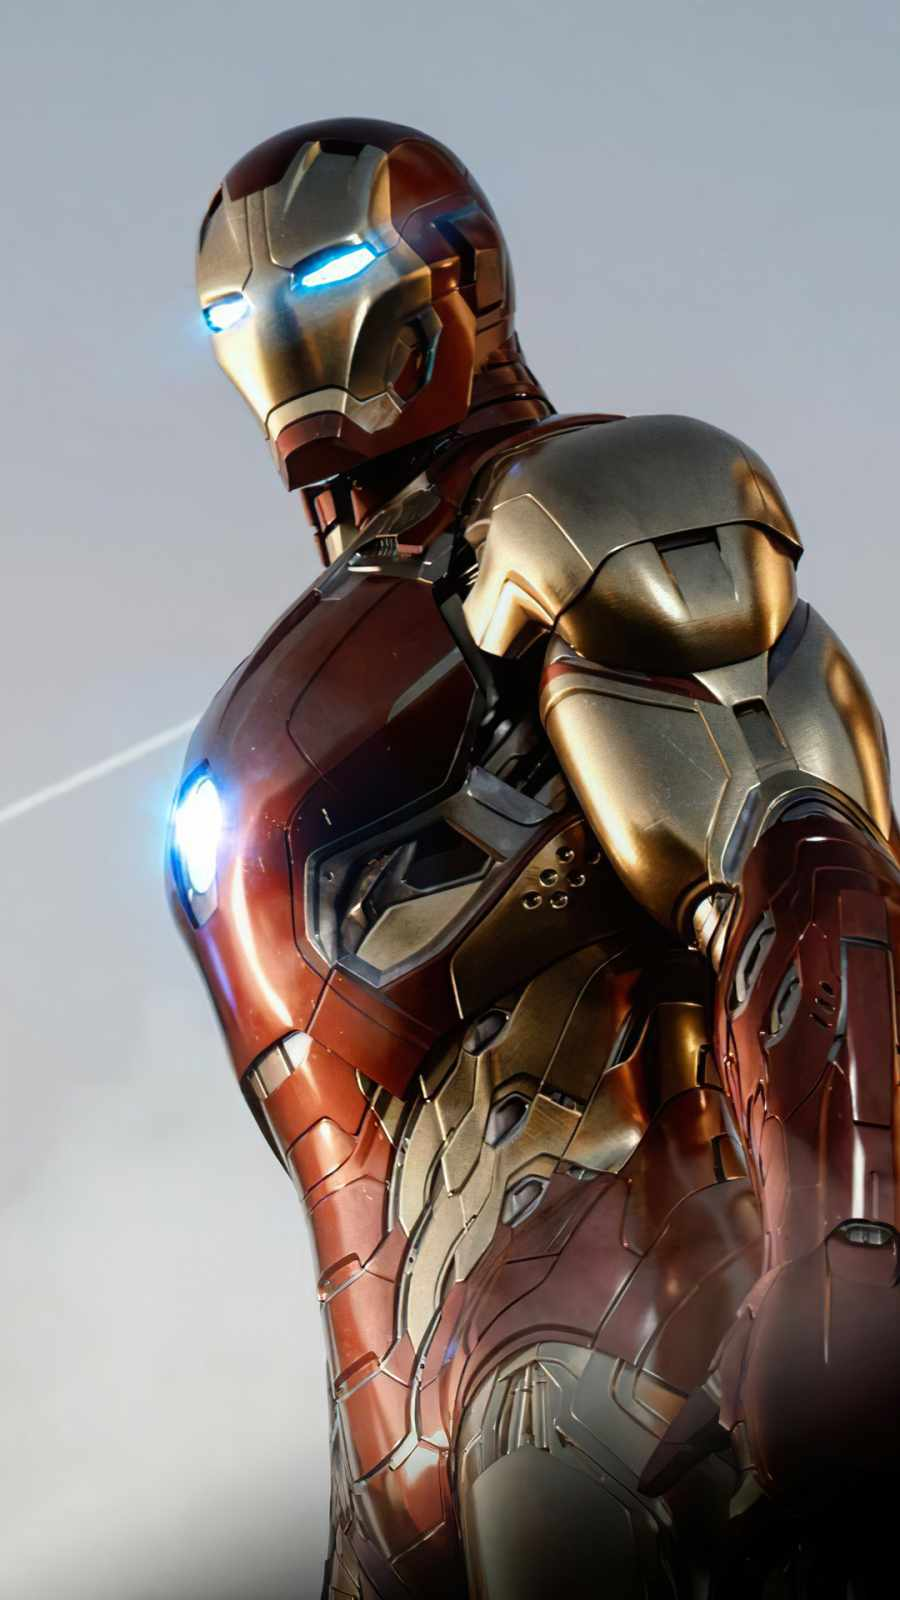 Iron Man Suit iPhone Wallpaper